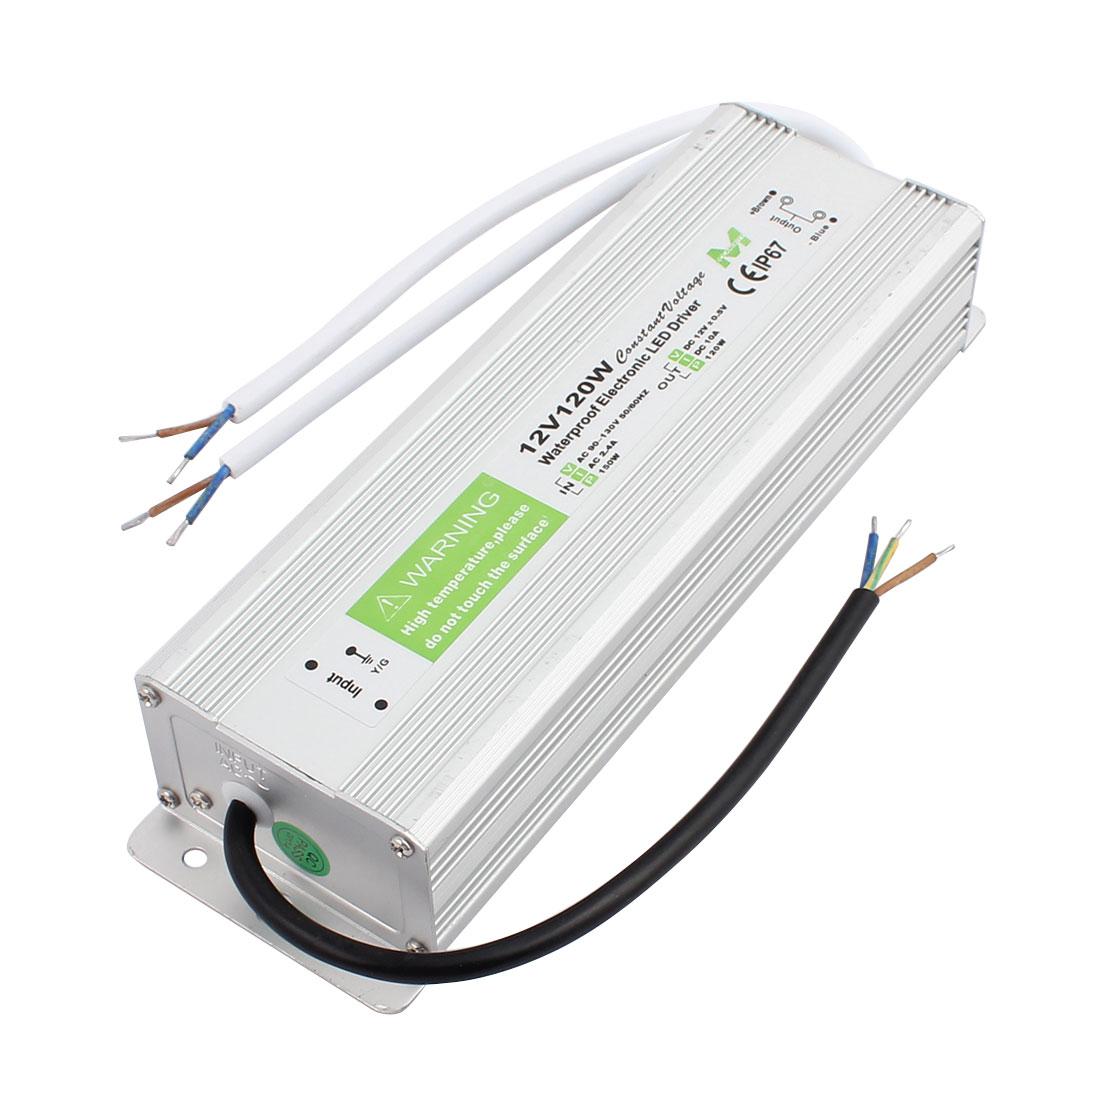 AC90~250V to DC12V 150 Watt Transformer IP67 Waterproof LED Driver Power Supply